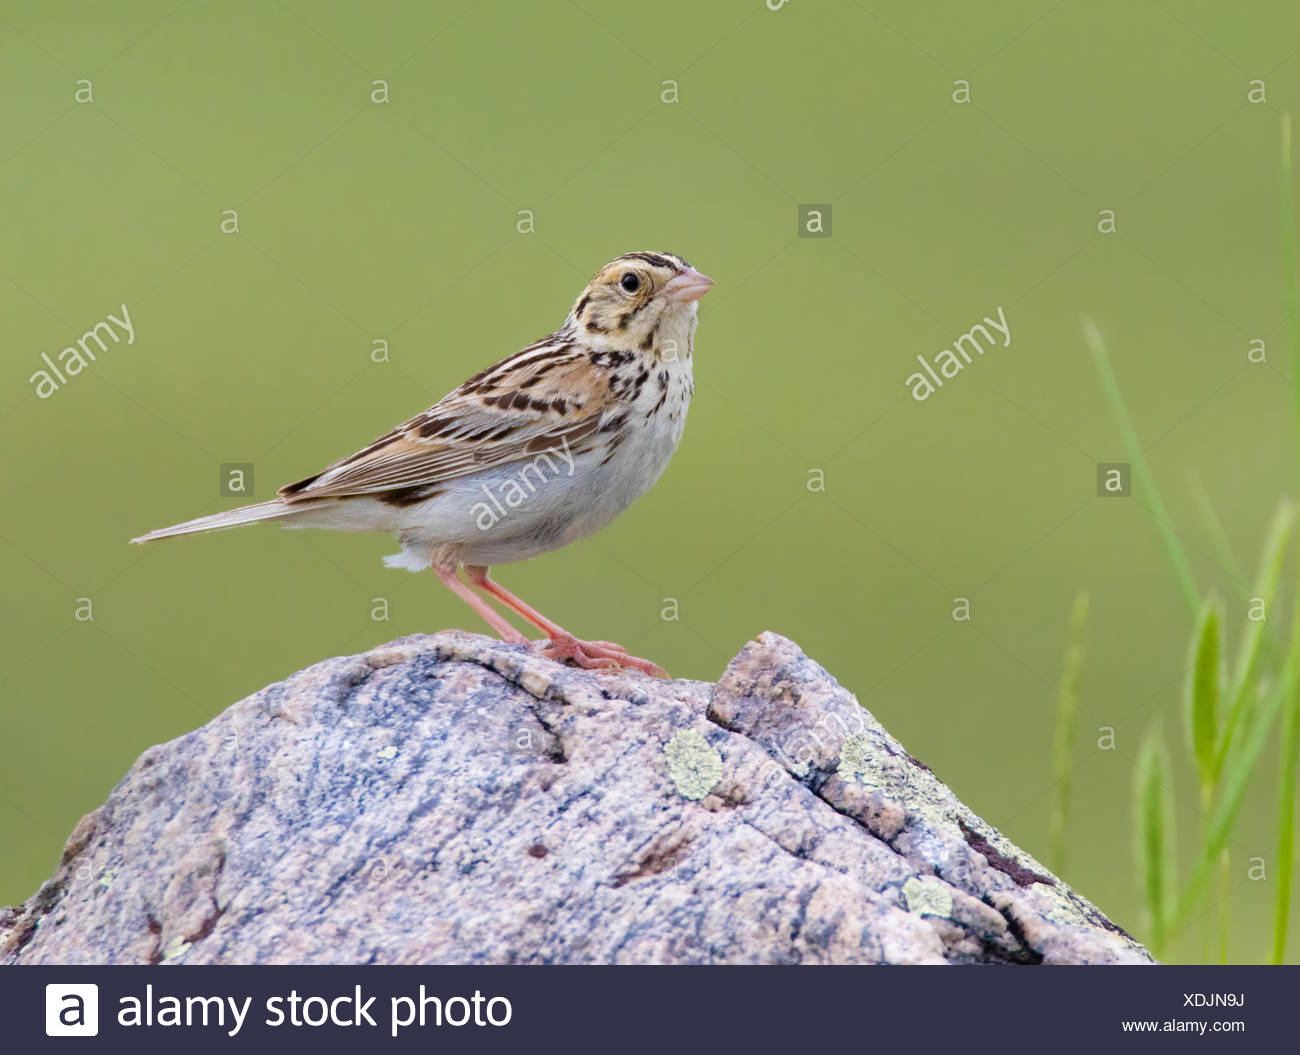 A Baird's Sparrow, Ammodramus bairdii, perched in a field at Grasslands National Park, Saskatchewan, Canada - Stock Image